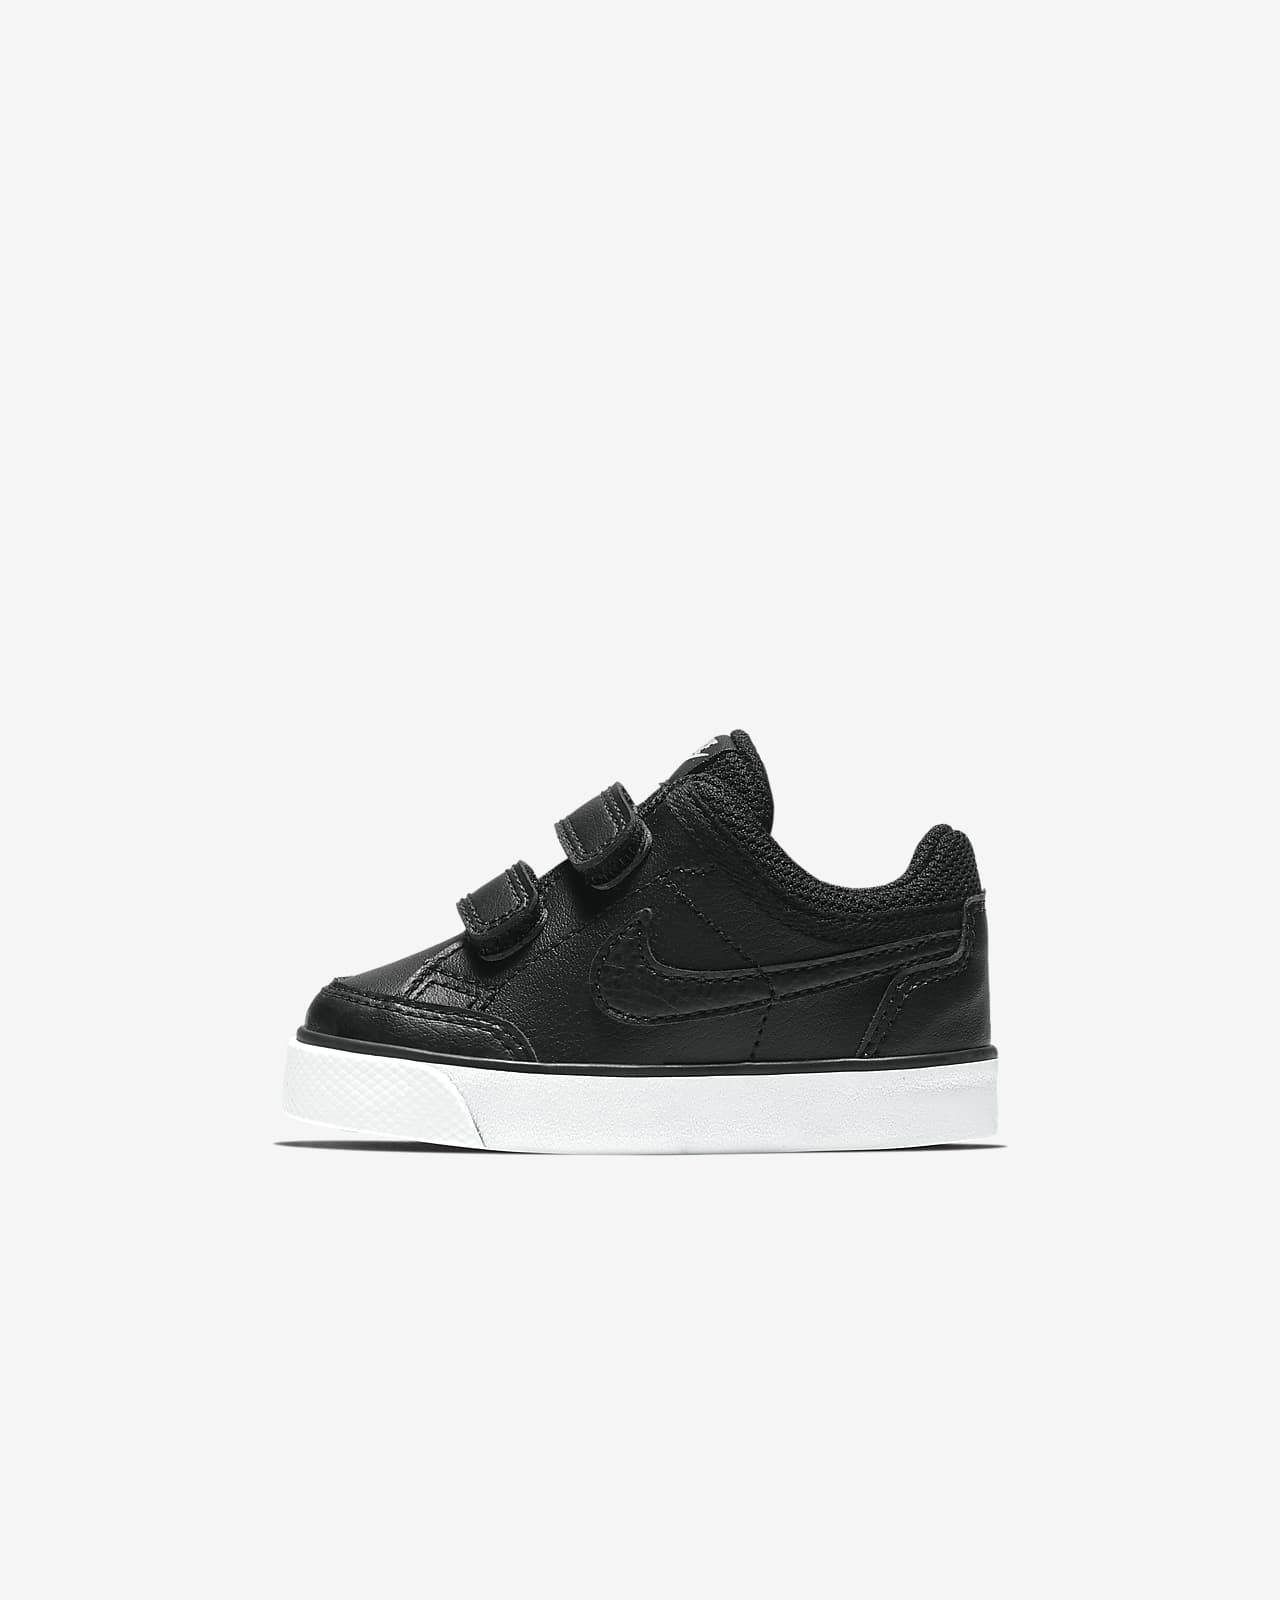 Nike Capri 3 LTR Baby/Toddler Shoe